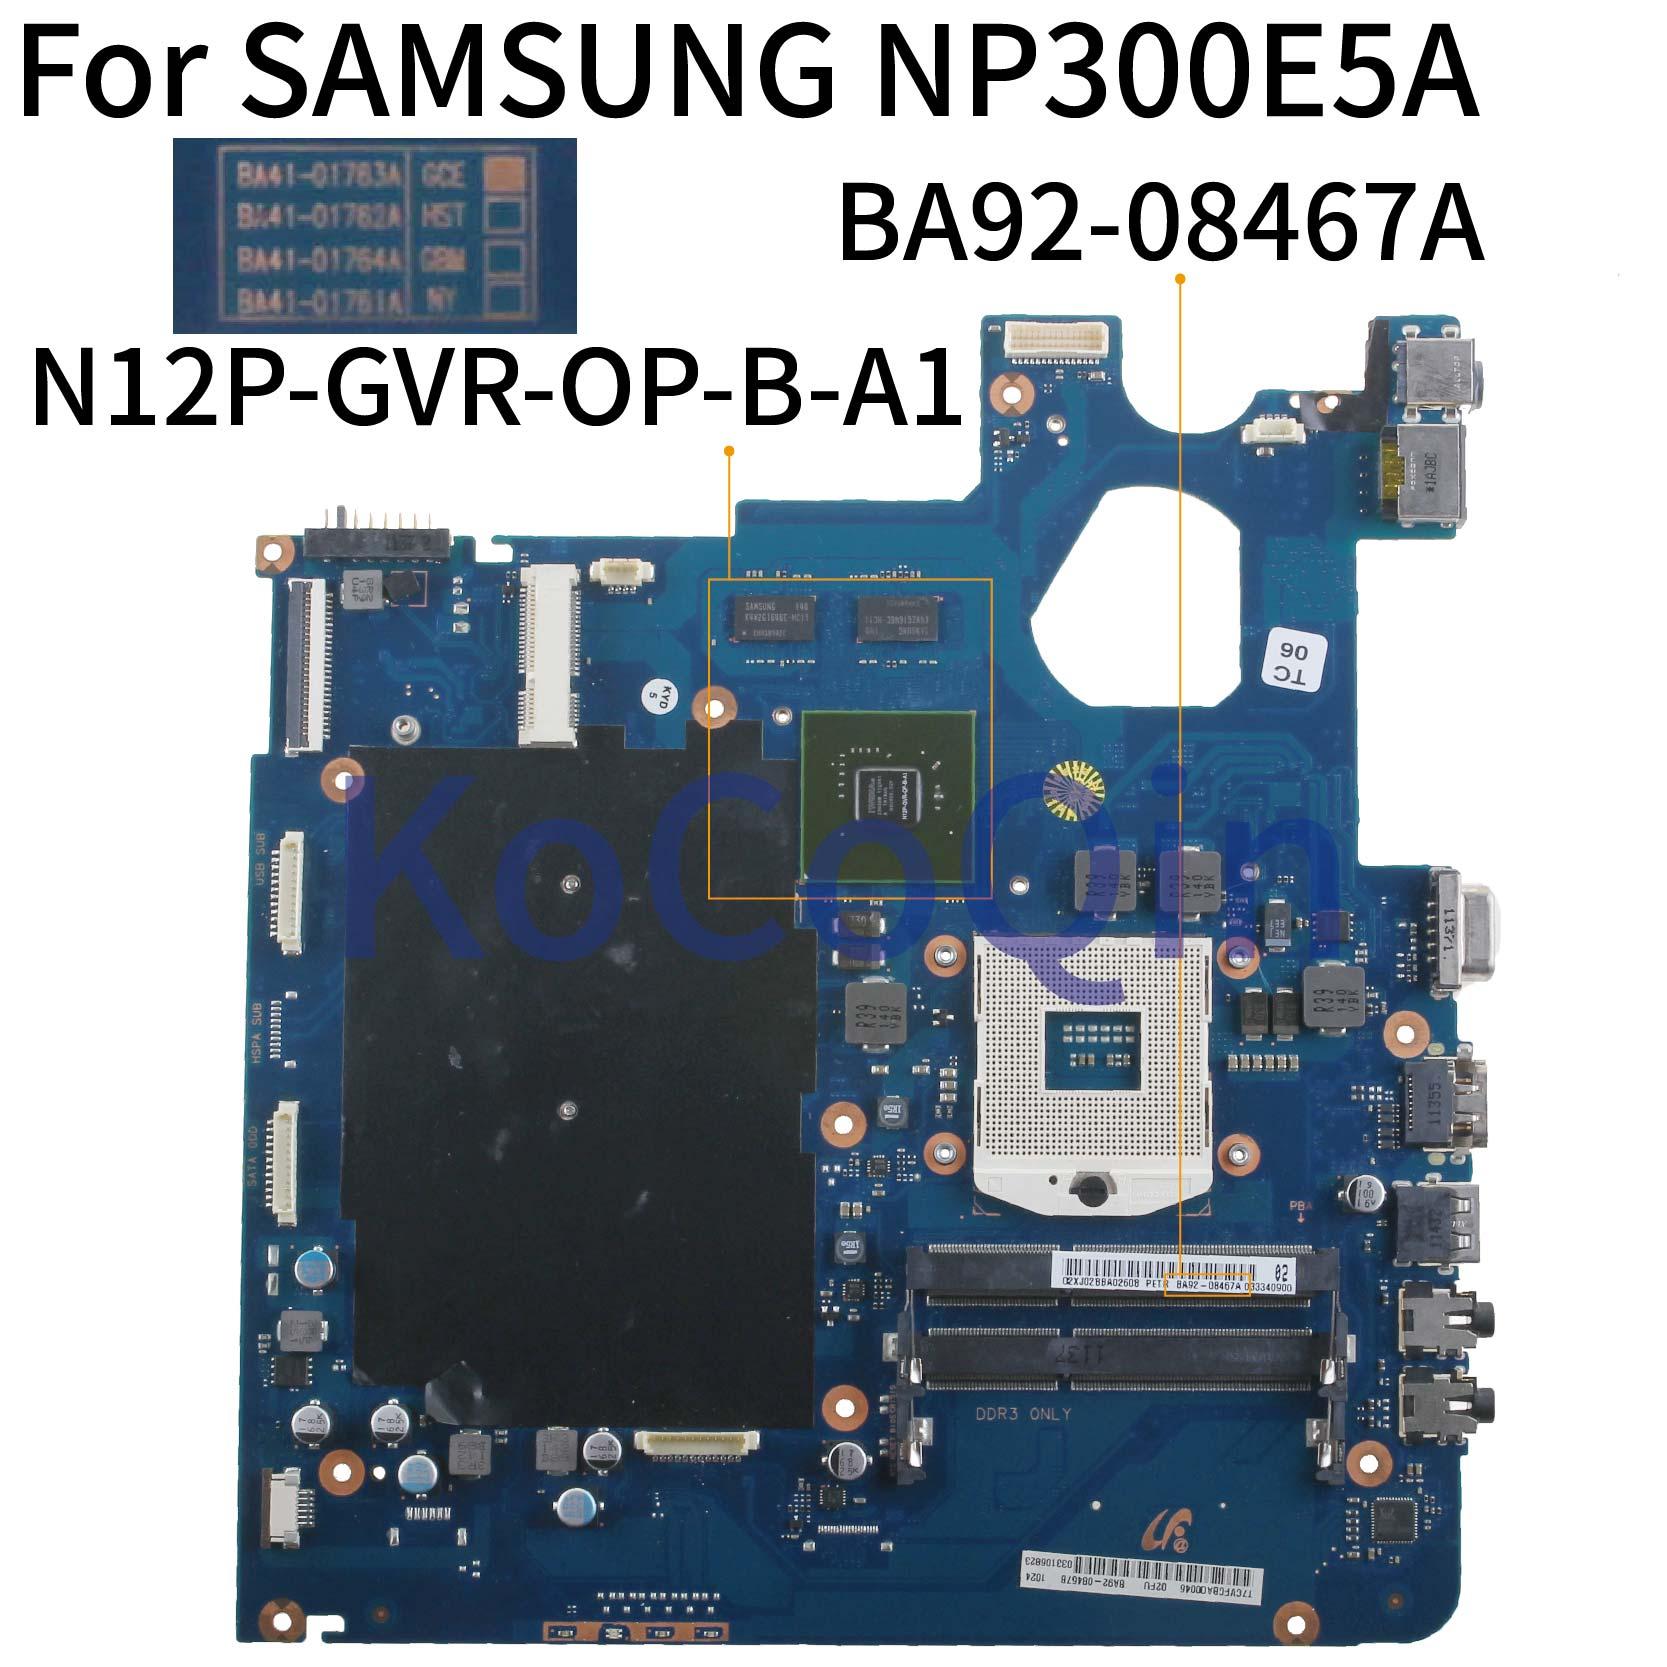 KoCoQin материнская плата для ноутбука SAMSUNG NP300E5A 300E5A NP 300E материнская плата BA41 01762A BA92 08467A N12P GVR OP B A1 HM65 Материнские платы для ноутбуков      АлиЭкспресс